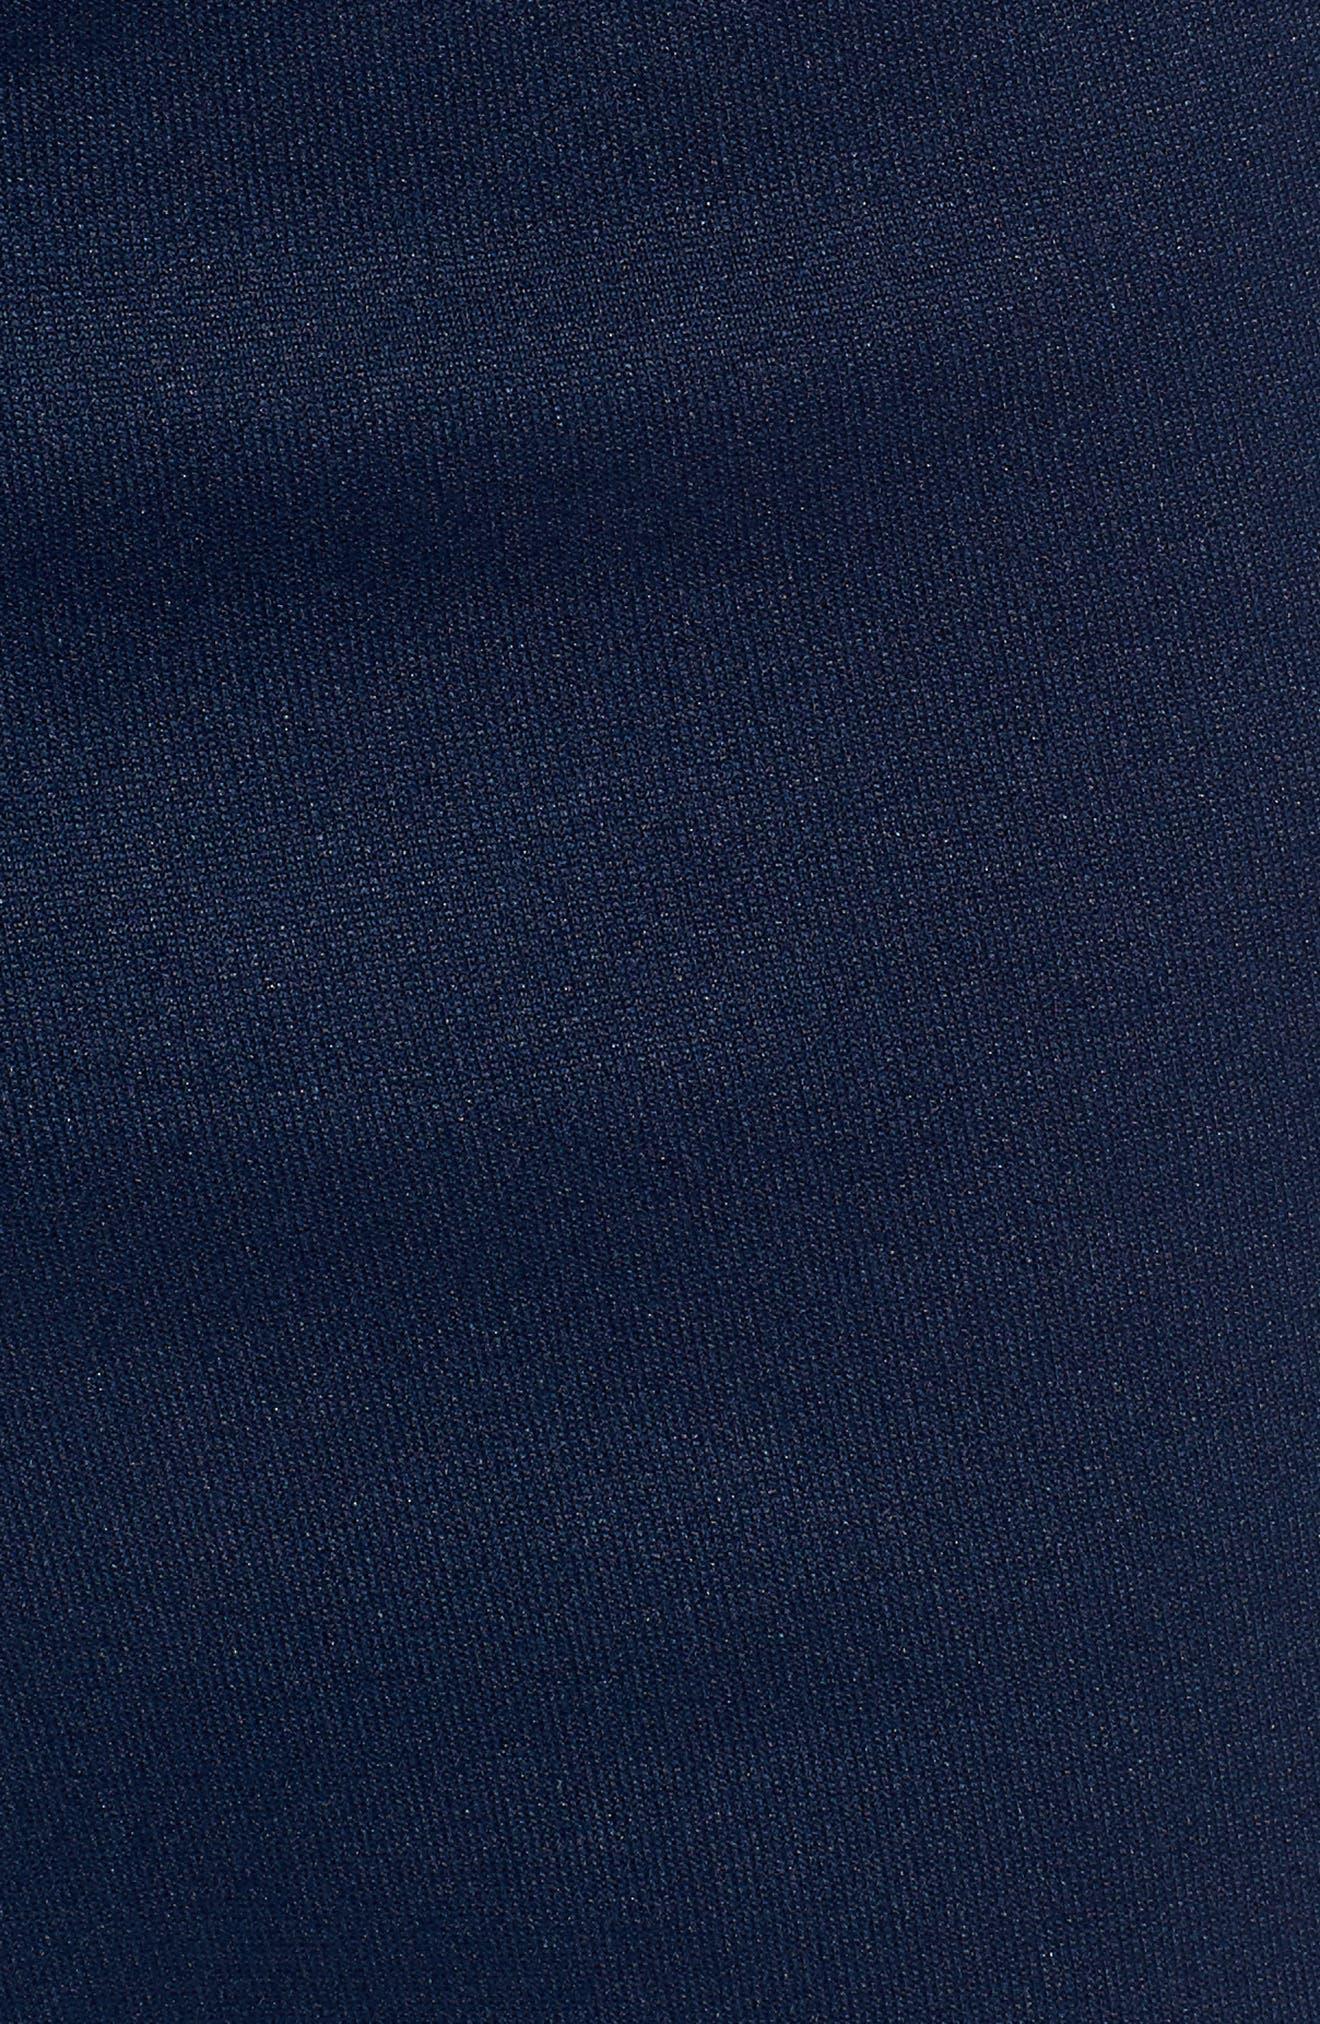 adidas Original SST Track Pants,                             Alternate thumbnail 4, color,                             COLLEGIATE NAVY